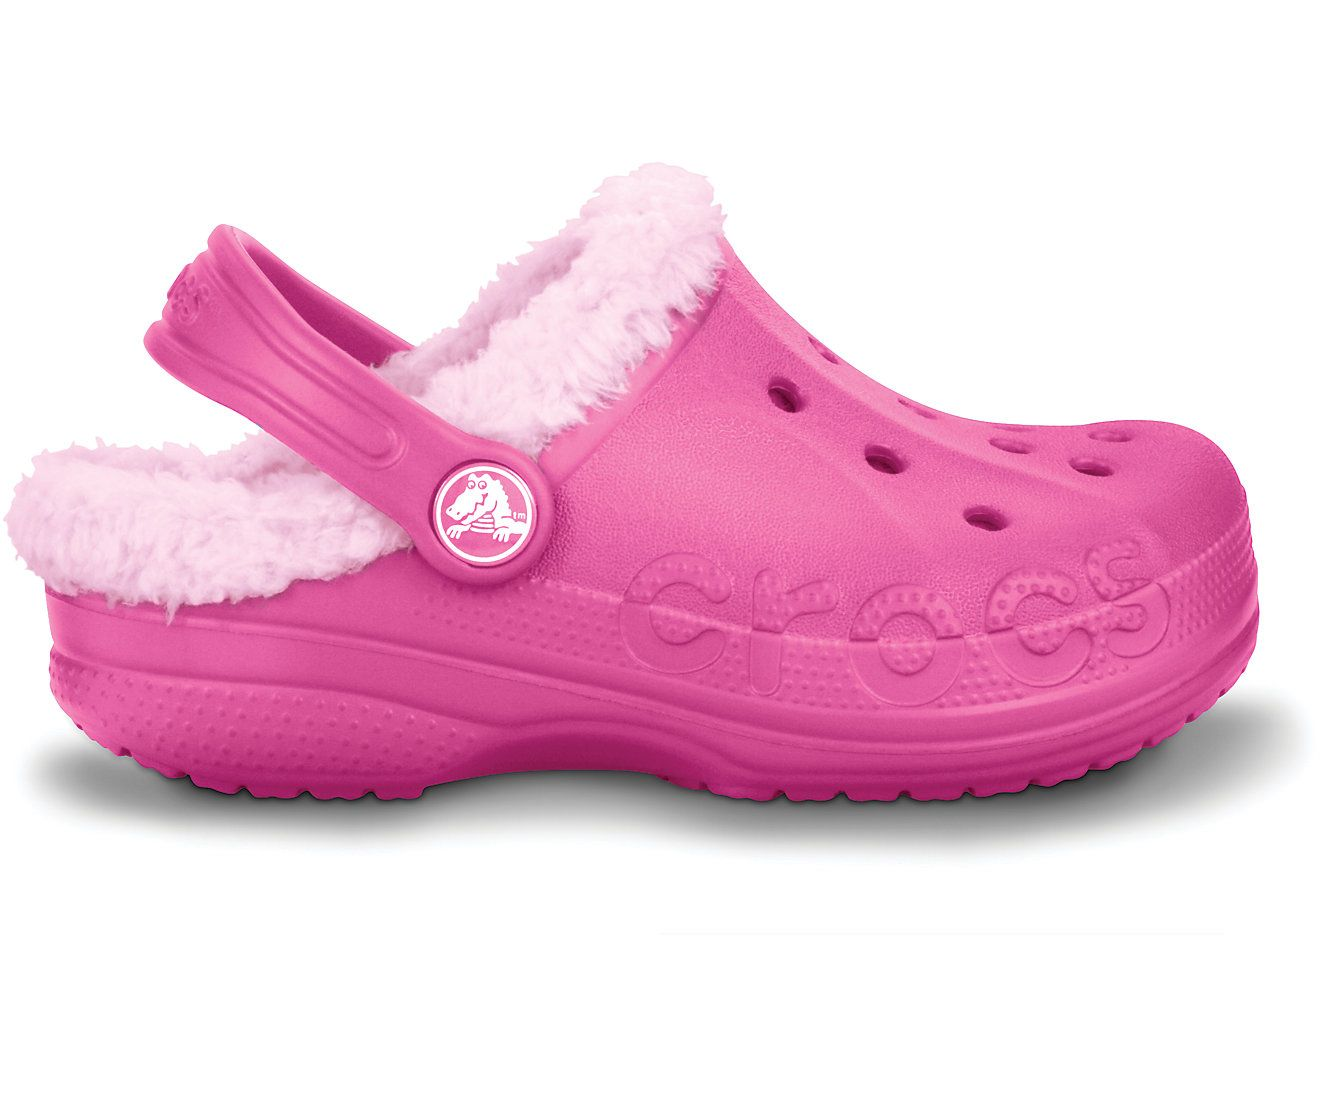 Comfortable Clog | Crocs Official Site